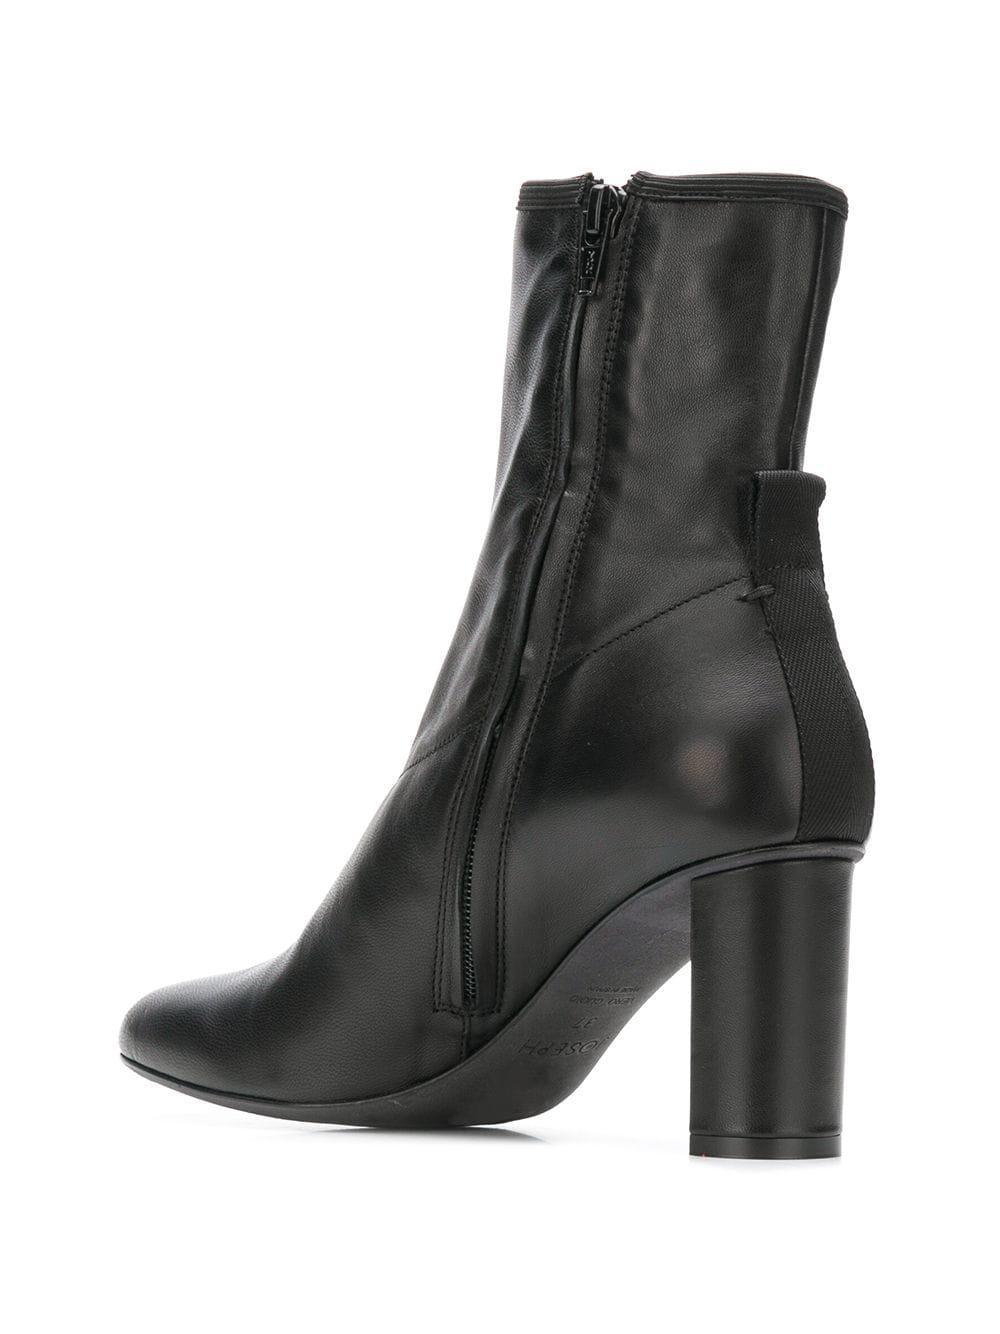 1e49aef78faa Joseph - Black Frida Block Heel Ankle Boot - Lyst. View fullscreen